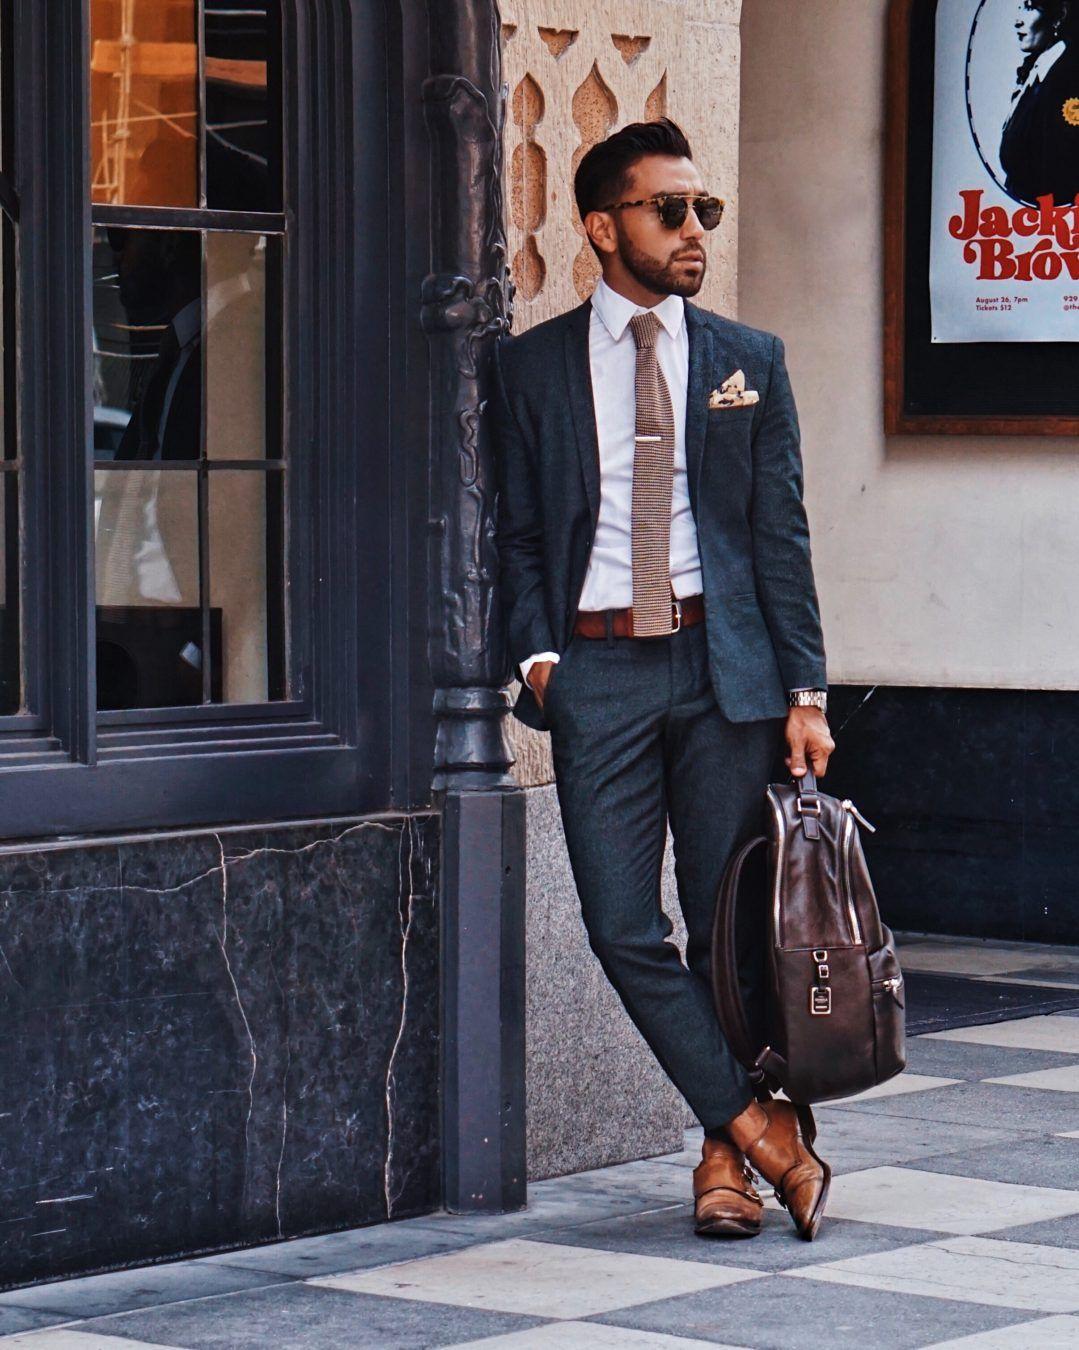 Gray suit + patterned tie + white dress shirt + pocket square + double monk  strap shoes